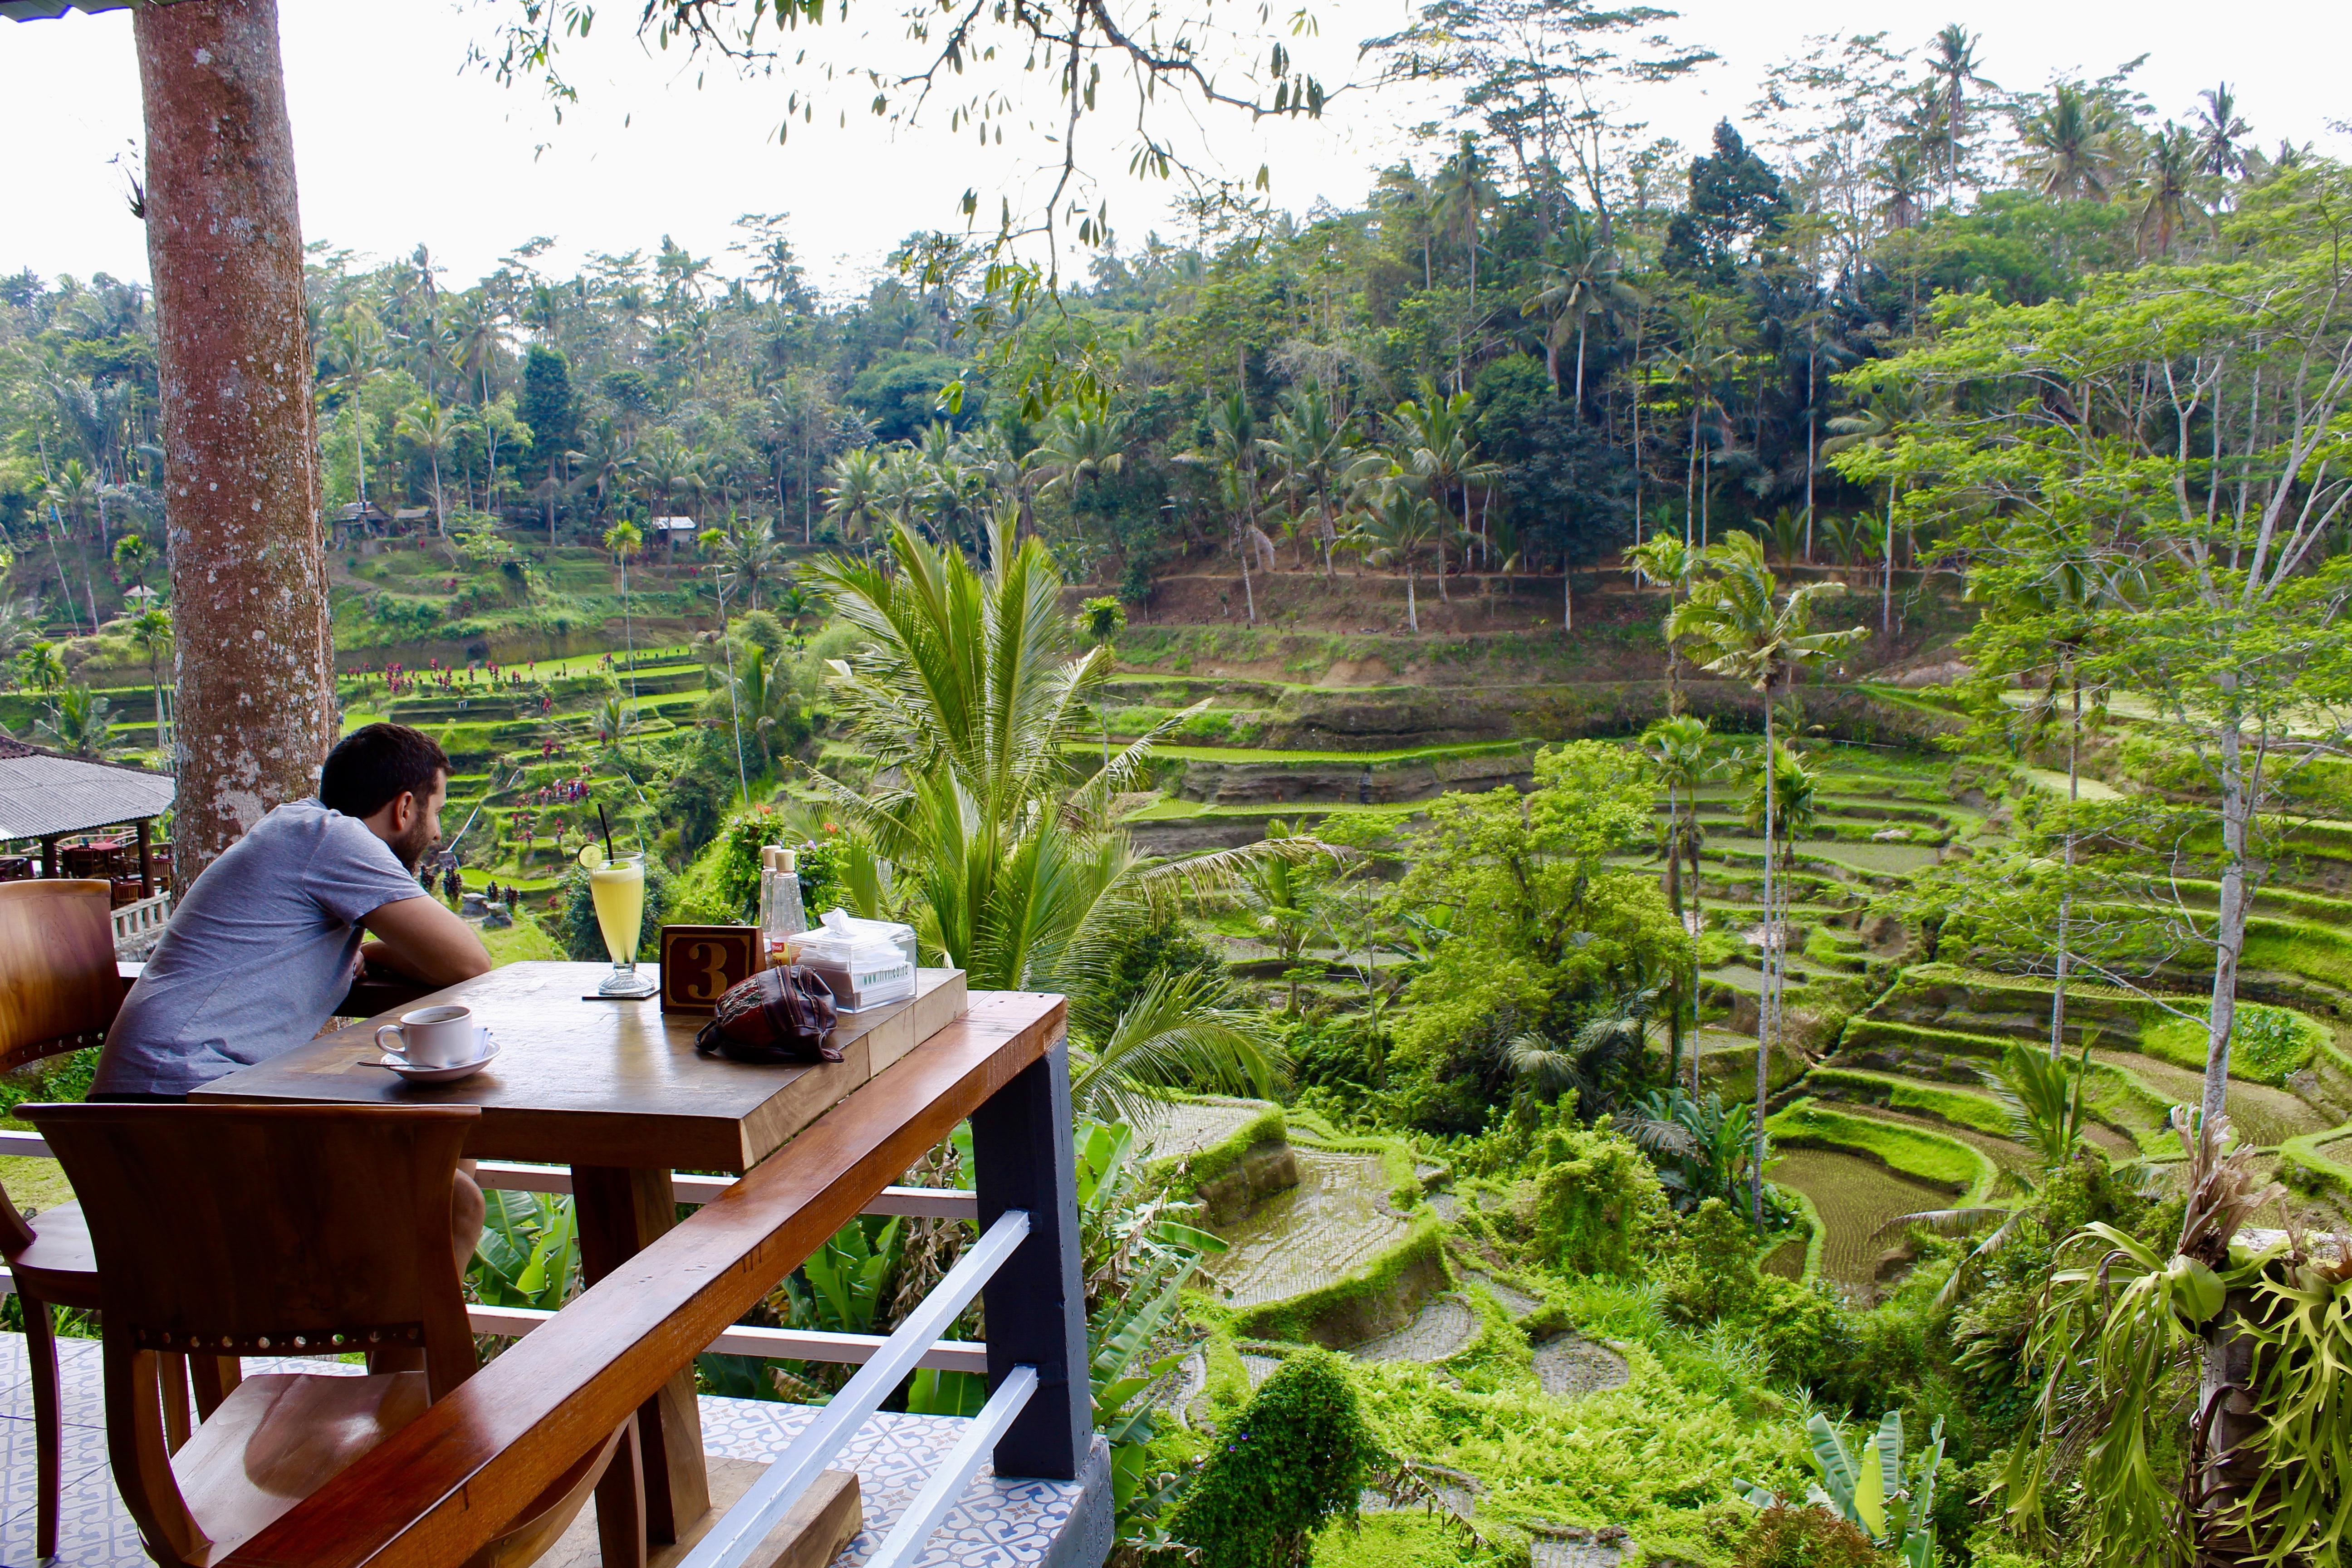 Terrazas de arroz Tegallalang en Bali